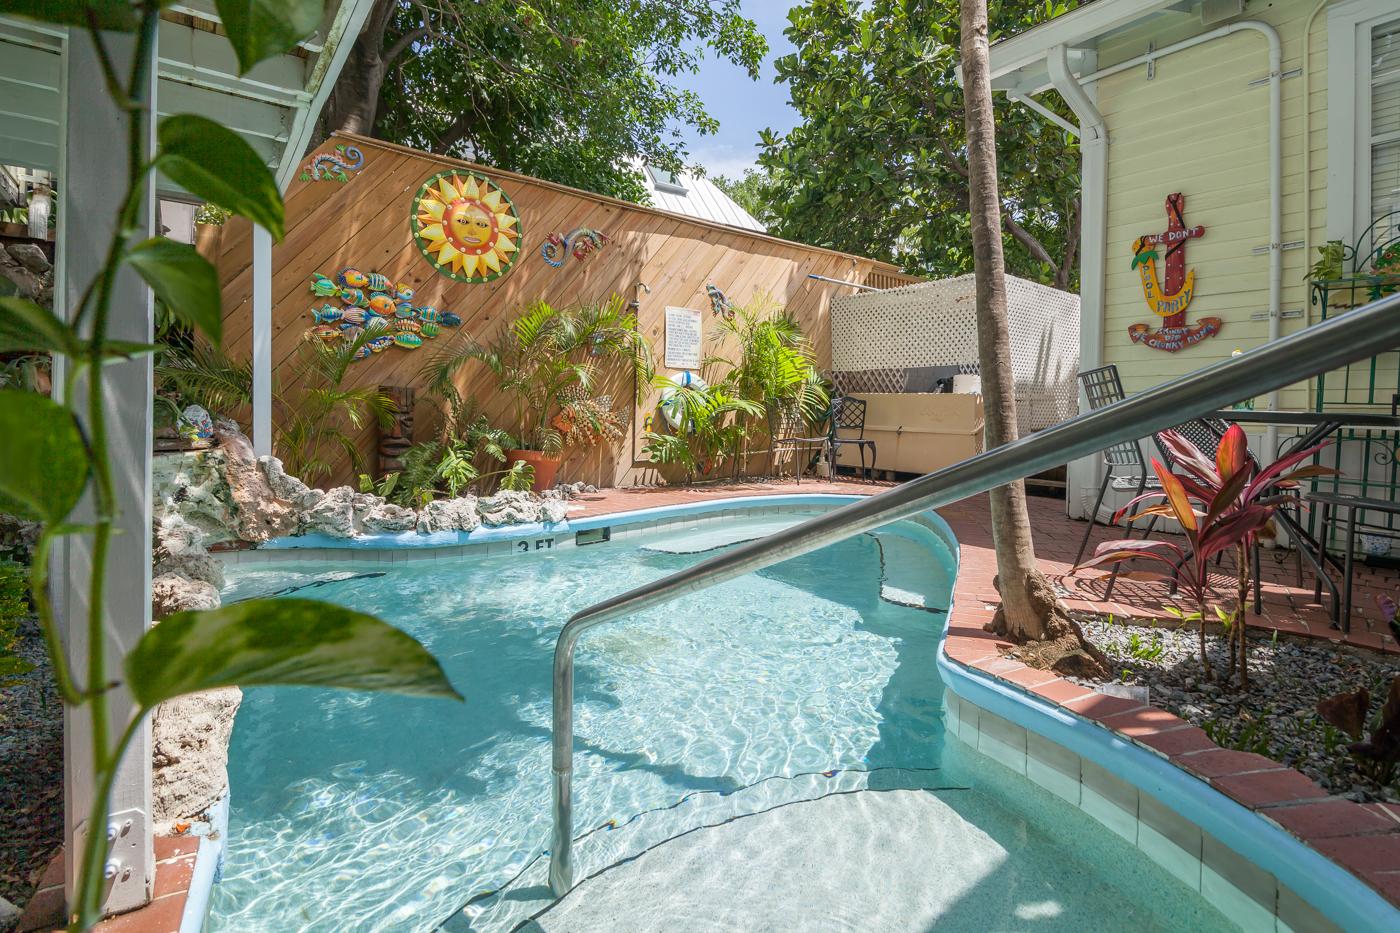 Rent west indies garden house bed breakfast key west for Chelsea pool garden key west